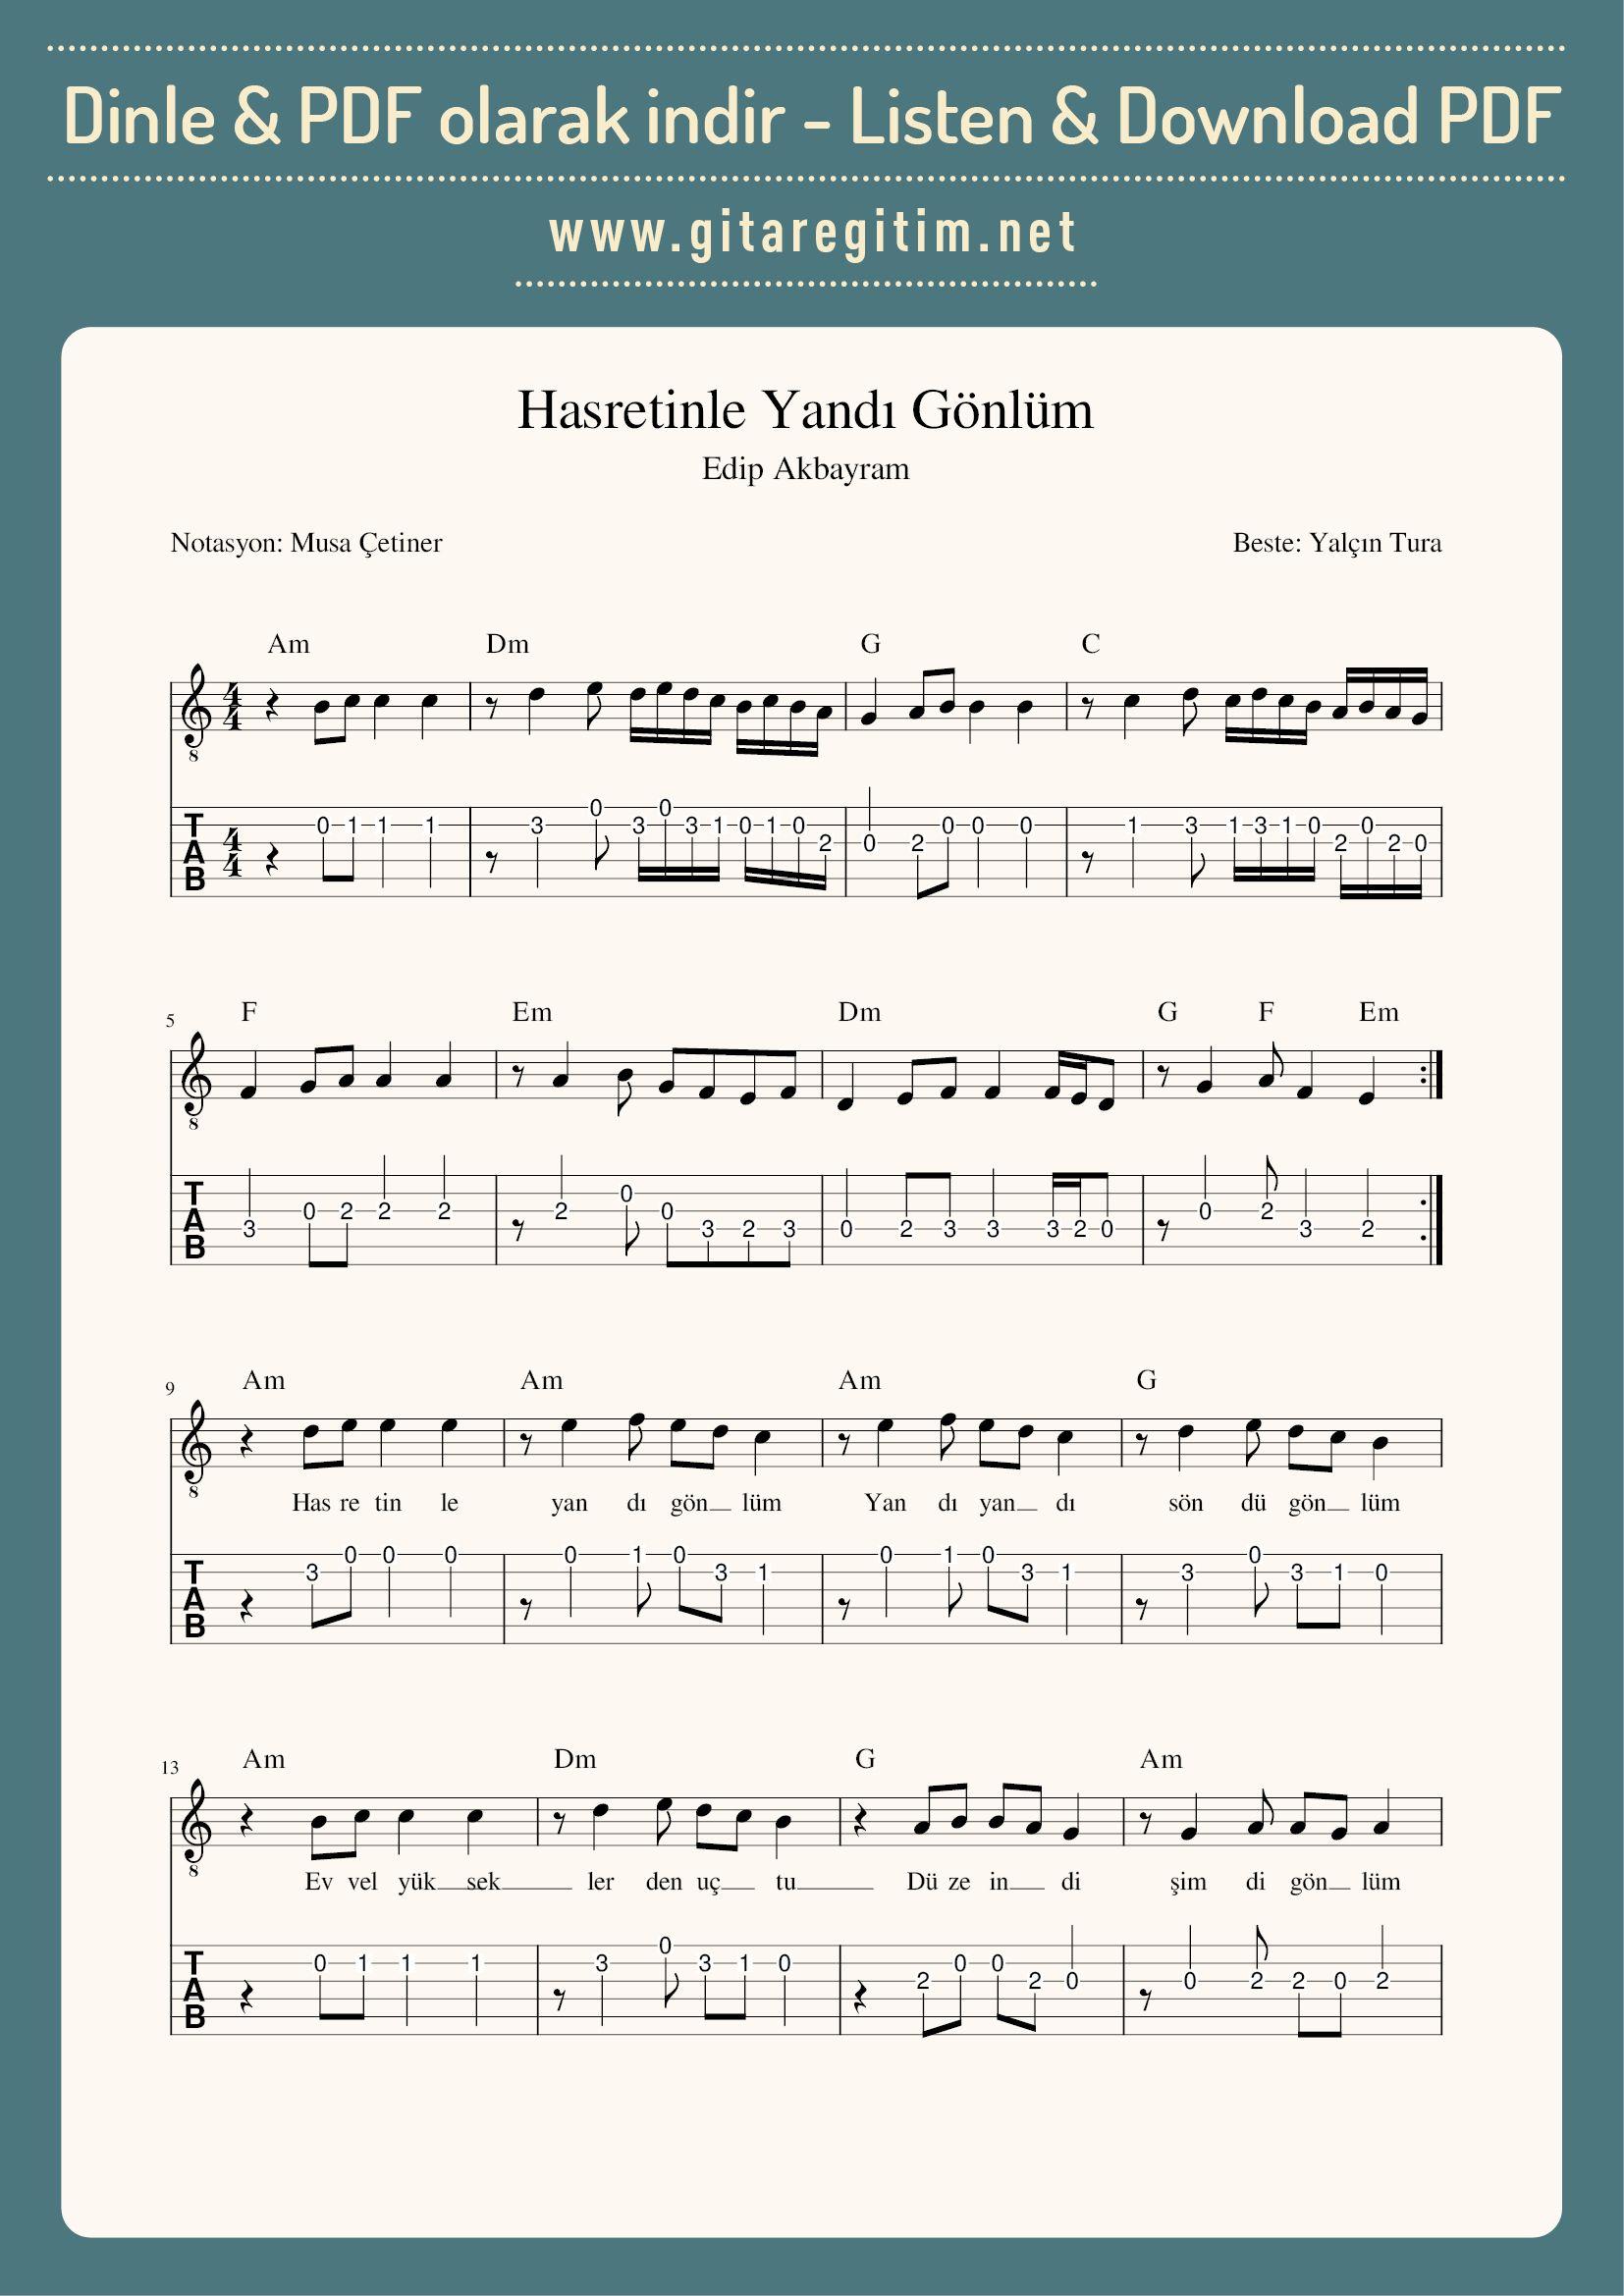 Hasretinle Yandi Gonlum Nota Tab Akor Gitaregitim Net Notalara Dokulmus Muzik Muzik Muzik Notalari